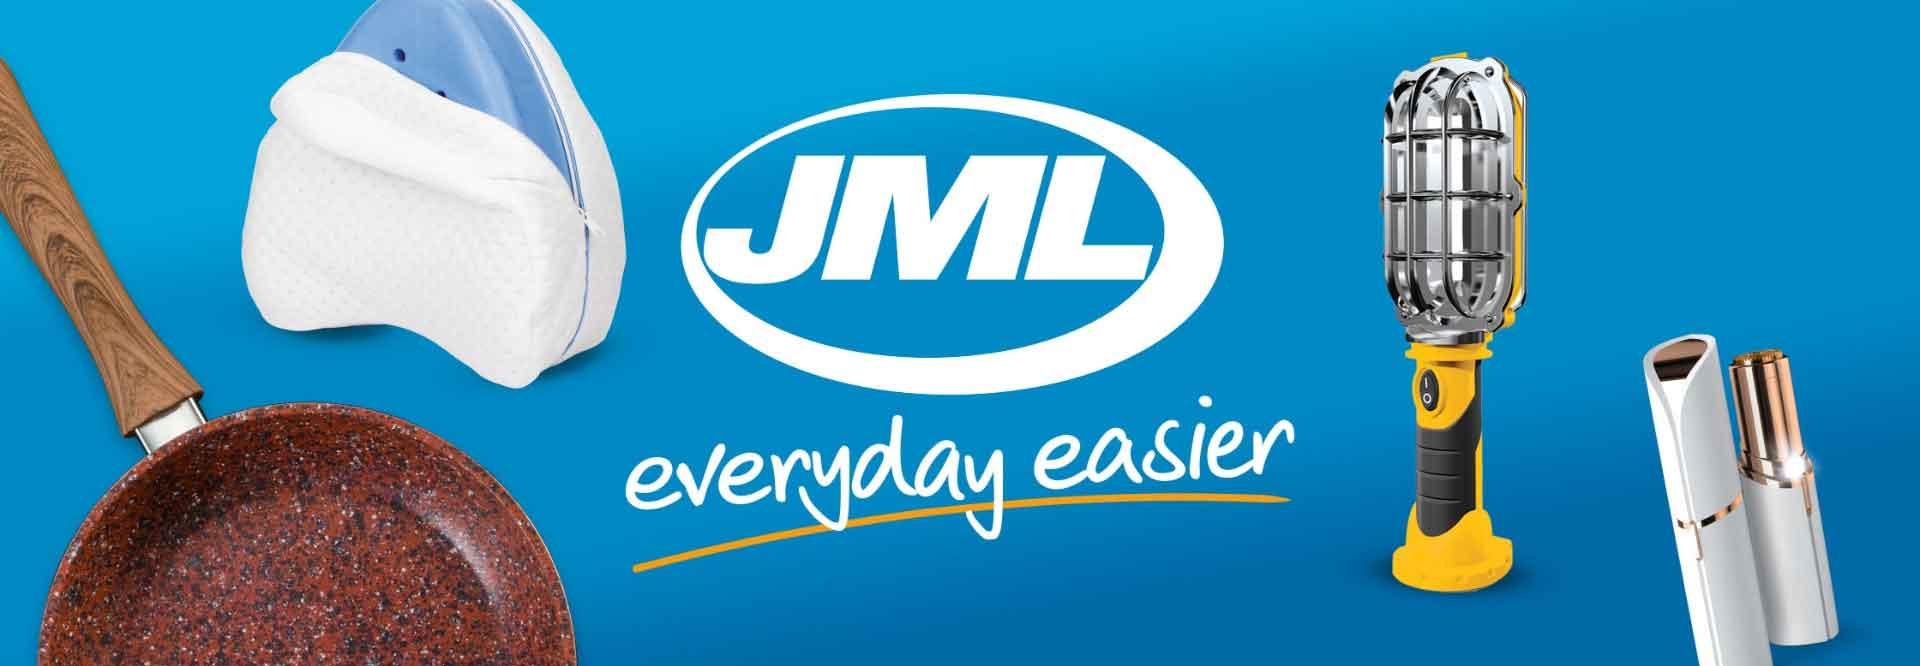 JML everyday easier